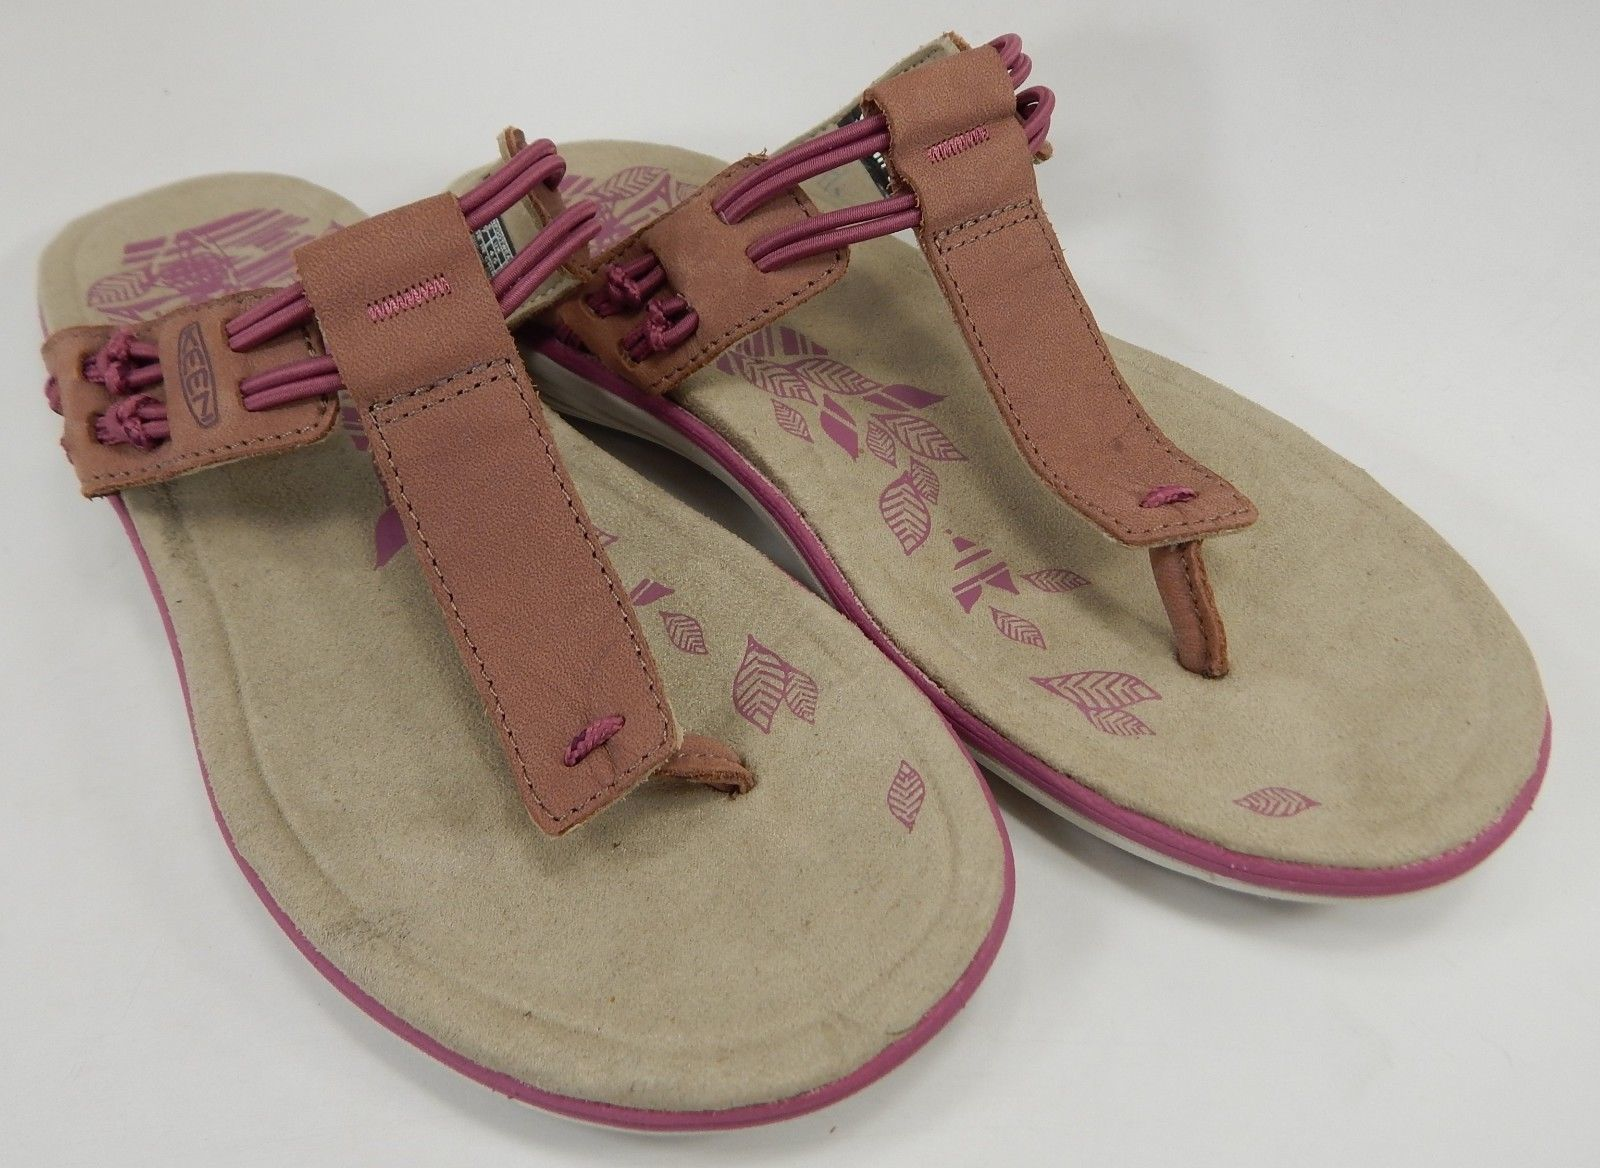 Keen Maya Strappy Slides Women's Sandals Size US 7 M (B) EU 37.5 Gray Purple